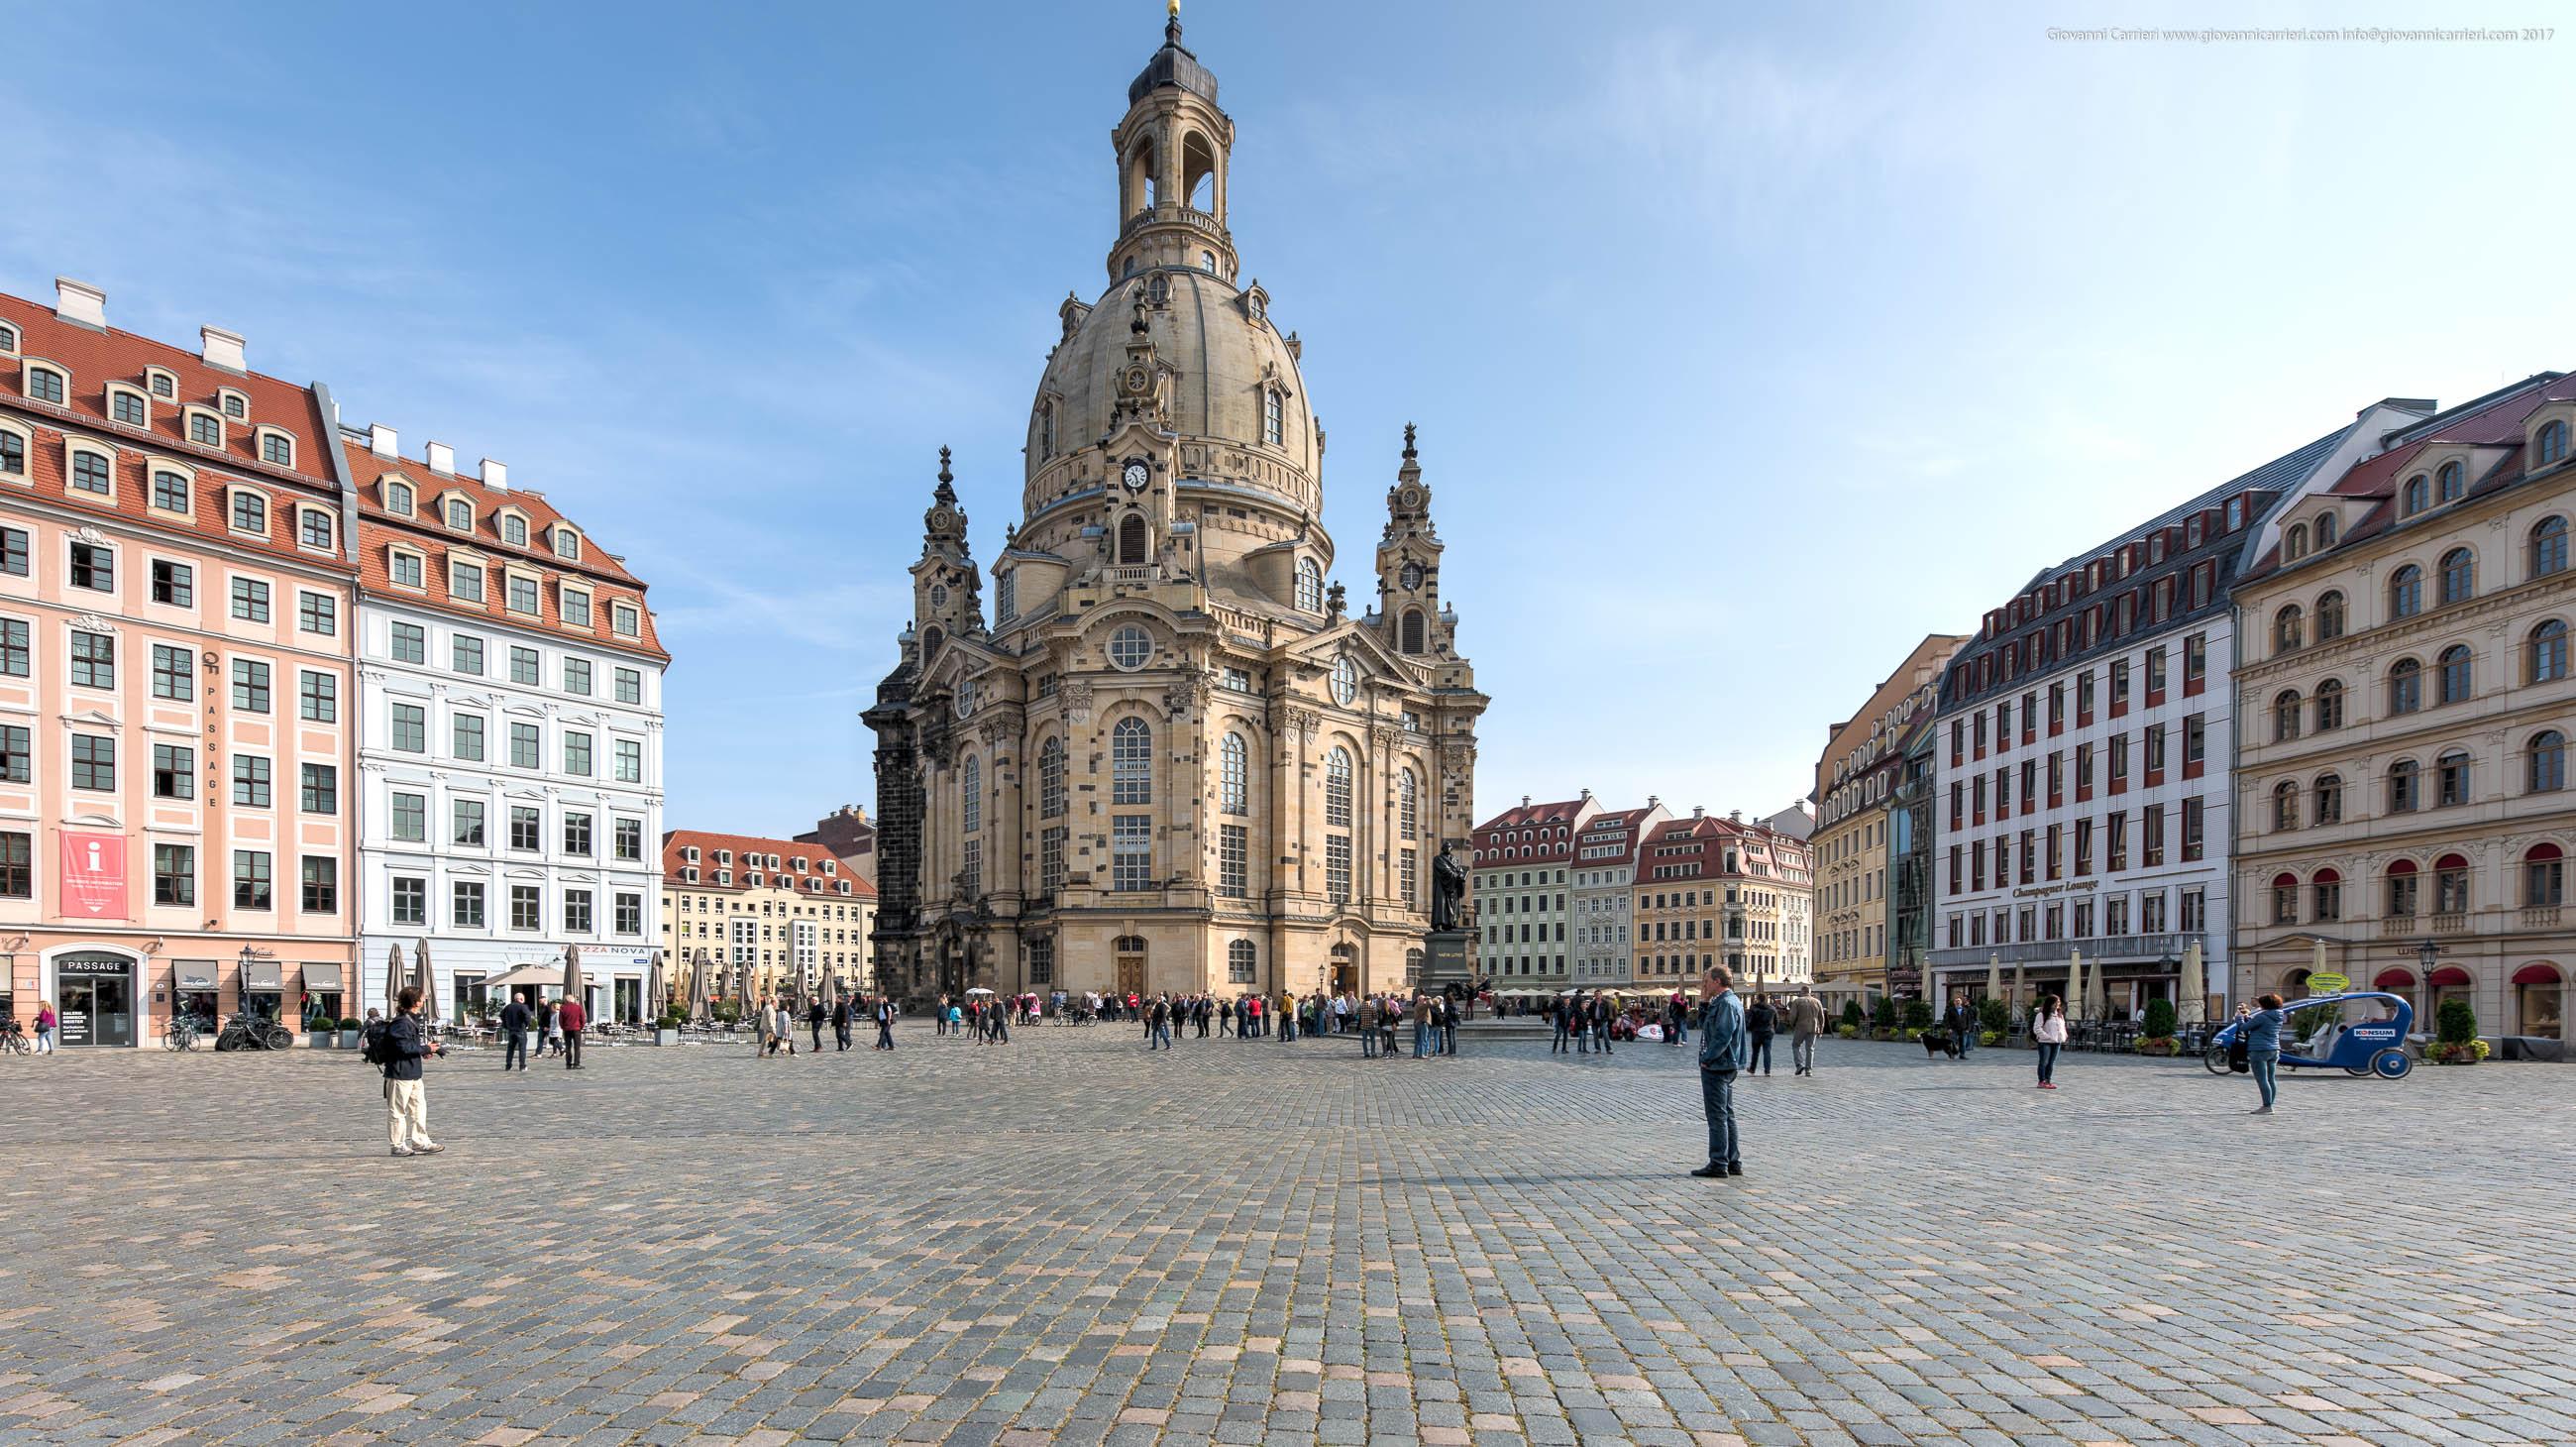 La chiesa di Nostra Signora, detta Frauenkirche